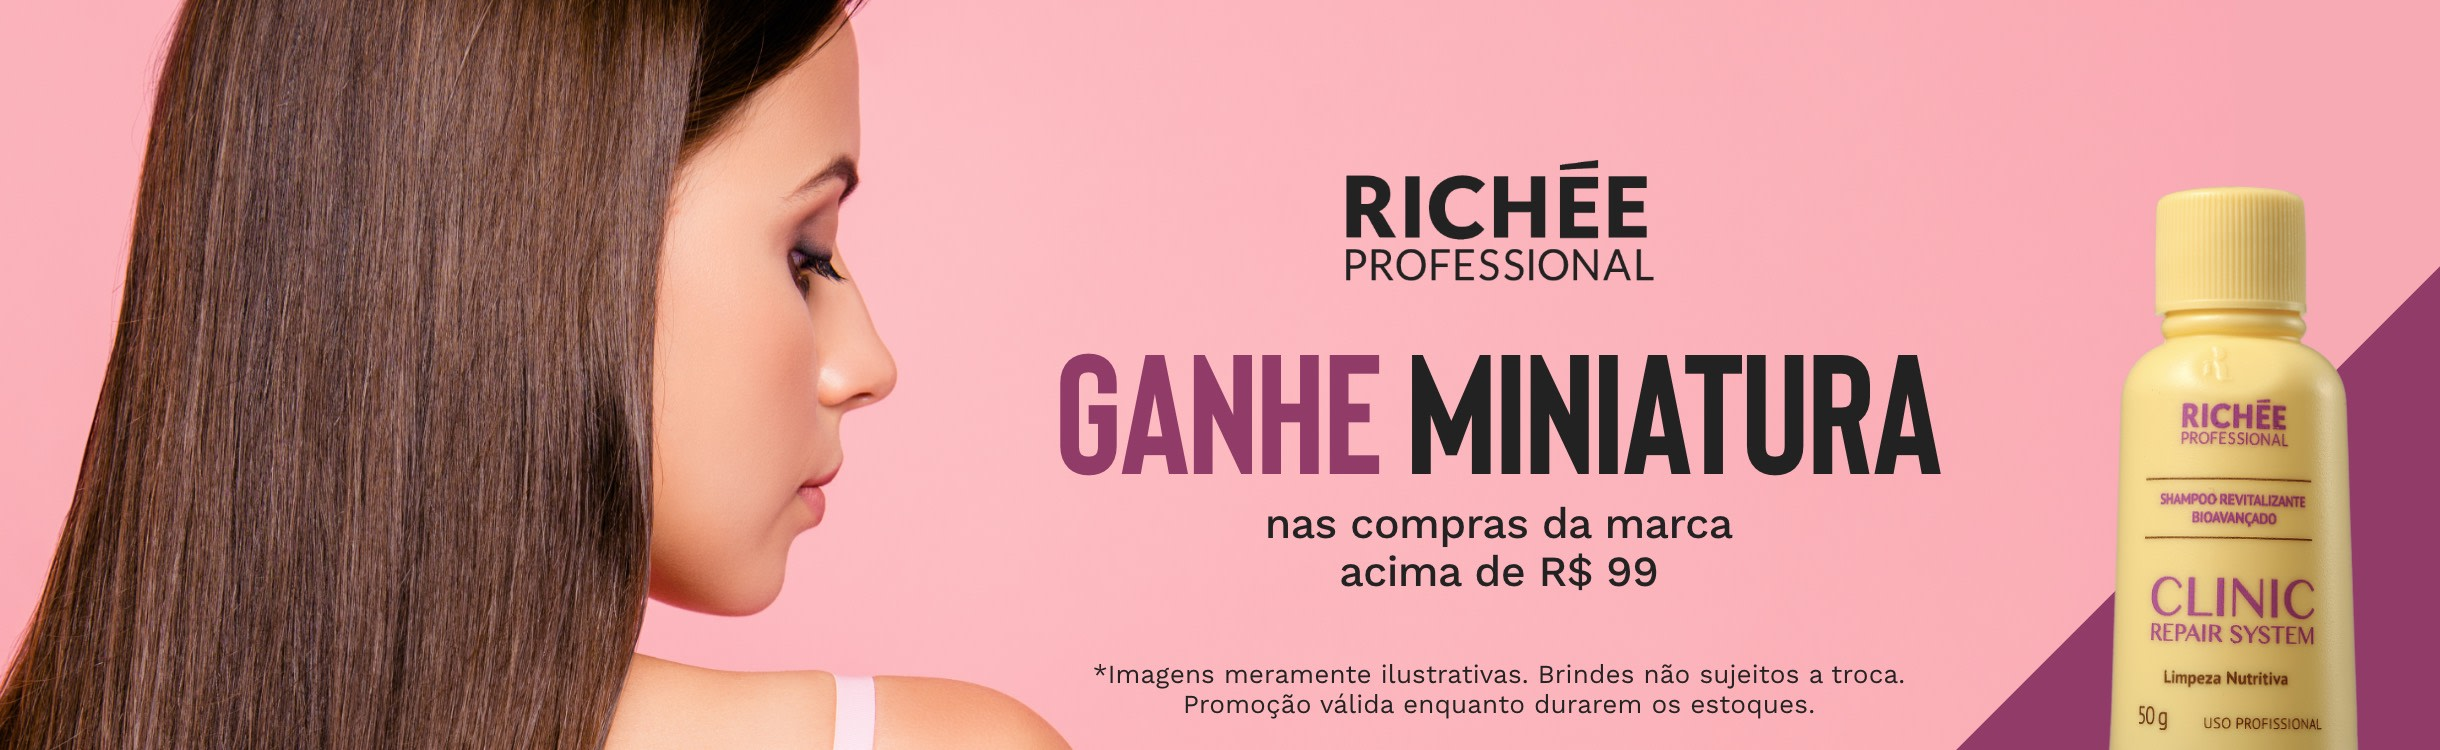 Richee professional